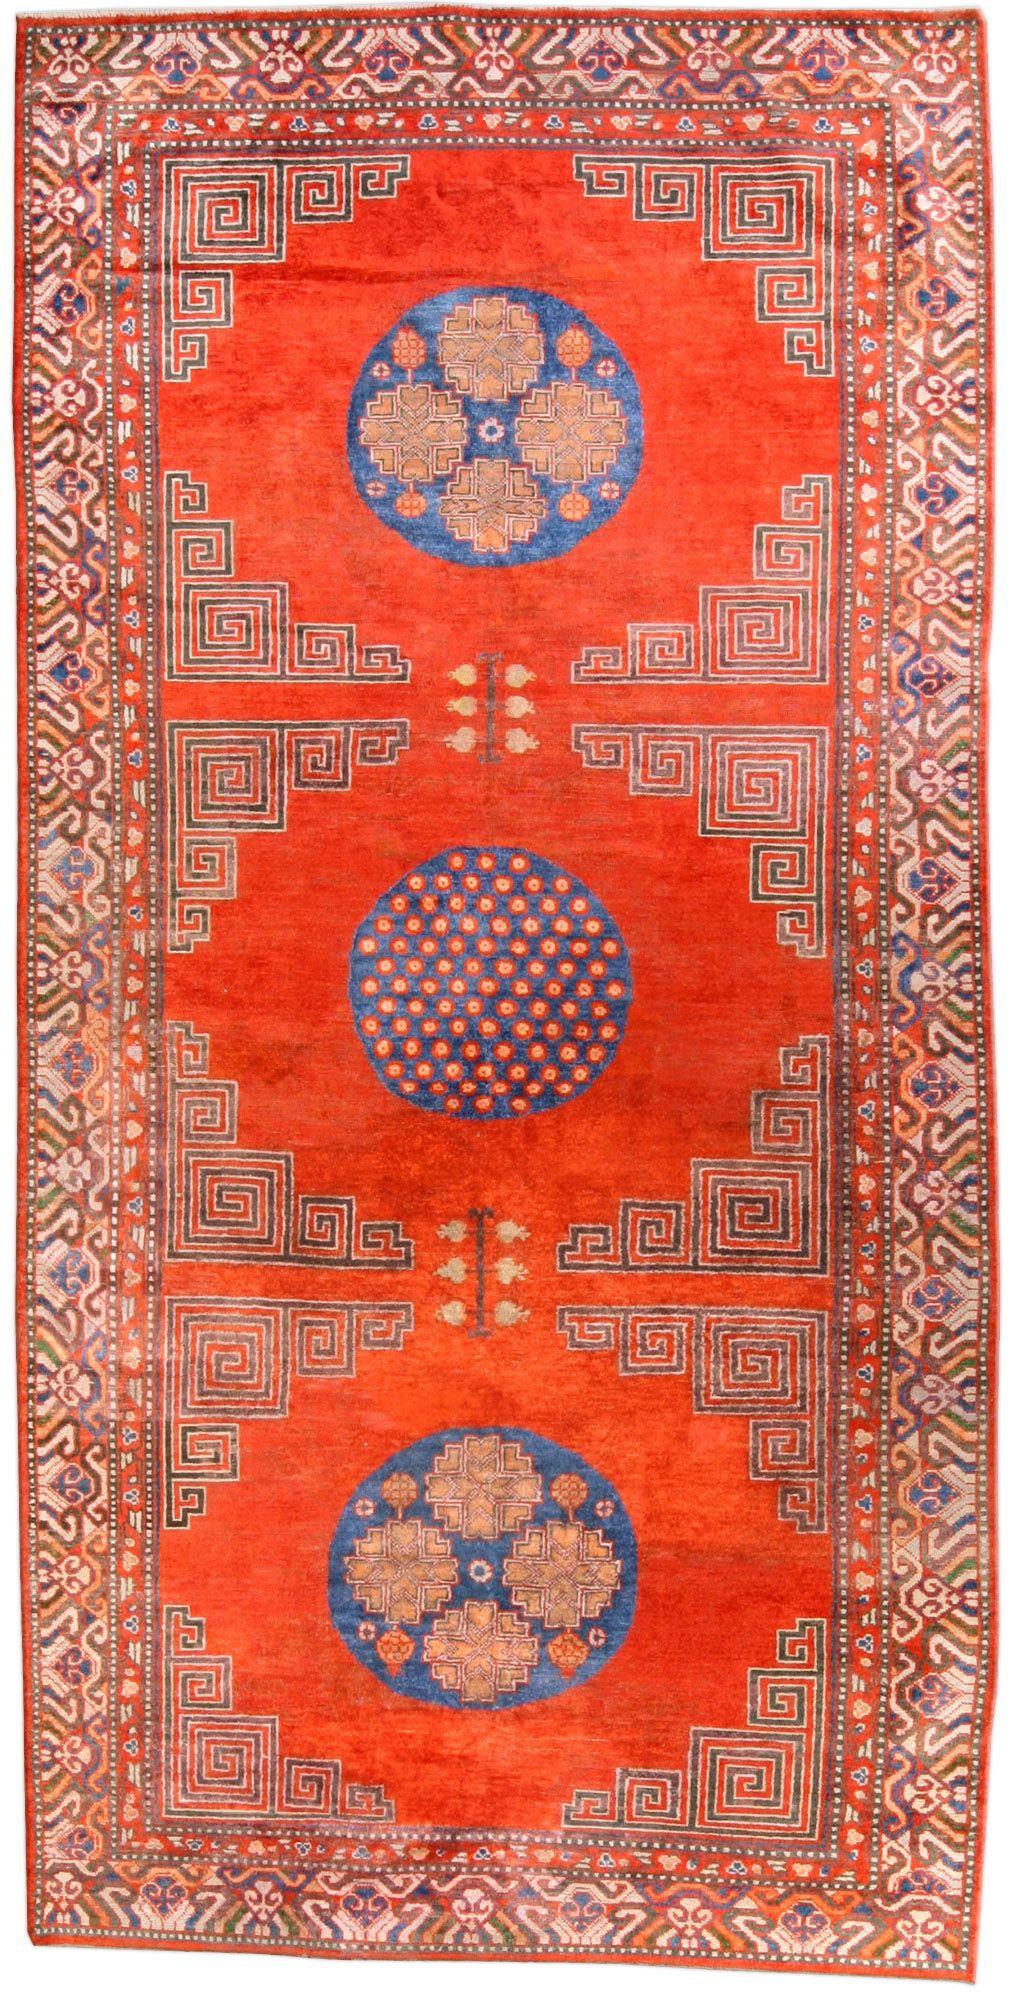 Doris Leslie Blau Most Trusted Antique Persian Rugs Dealer In New York City Rugs On Carpet Khotan Rugs Rugs